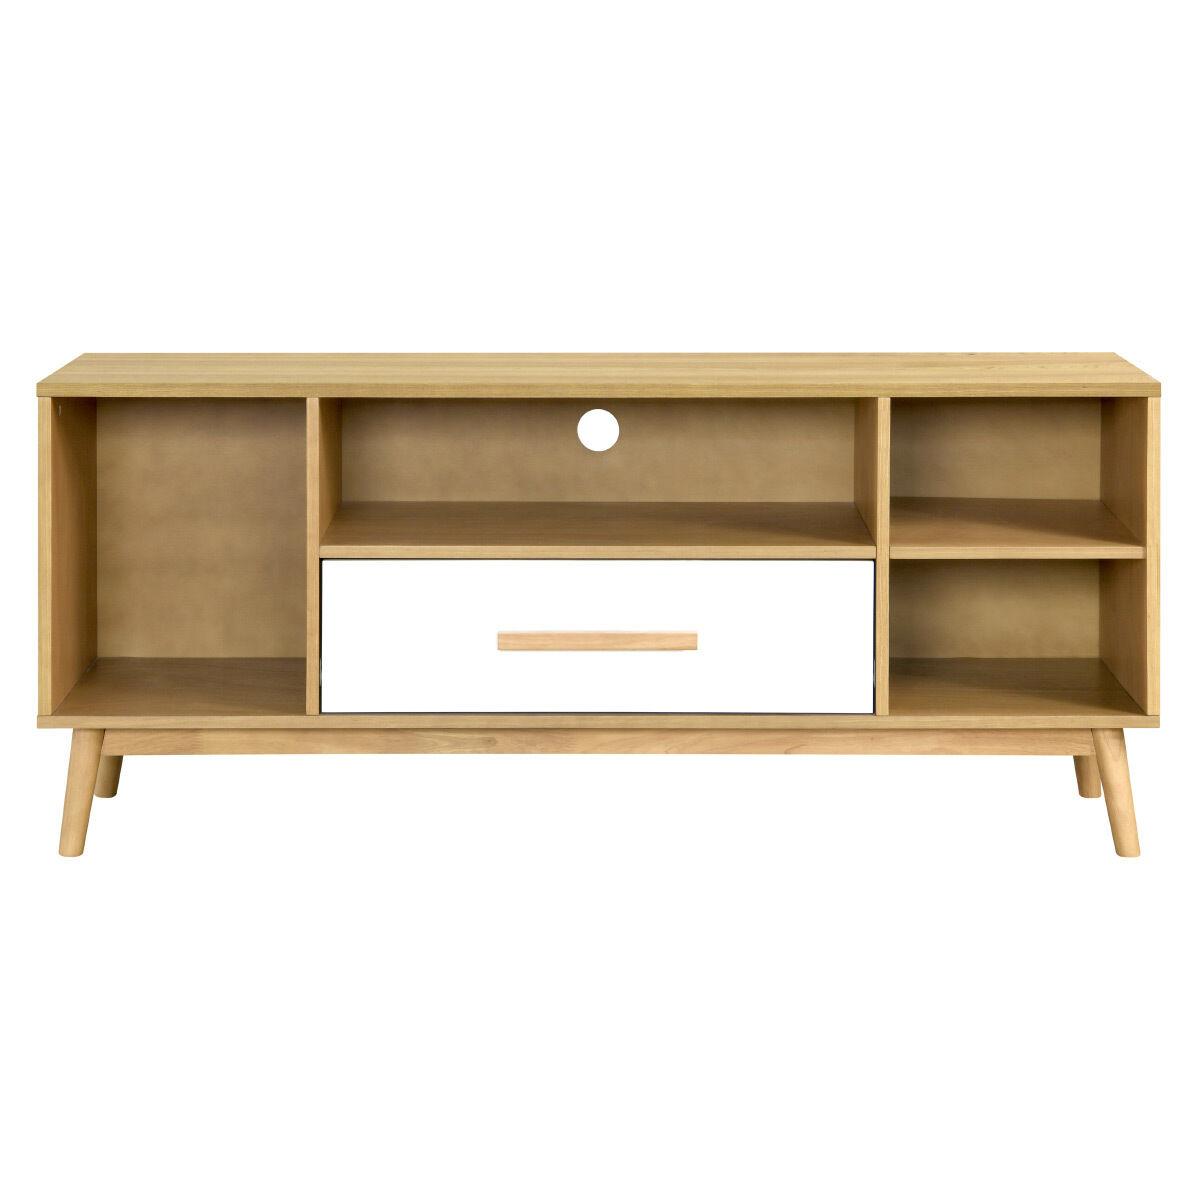 Miliboo Meuble TV scandinave bois clair et blanc 1 tiroir TALIA